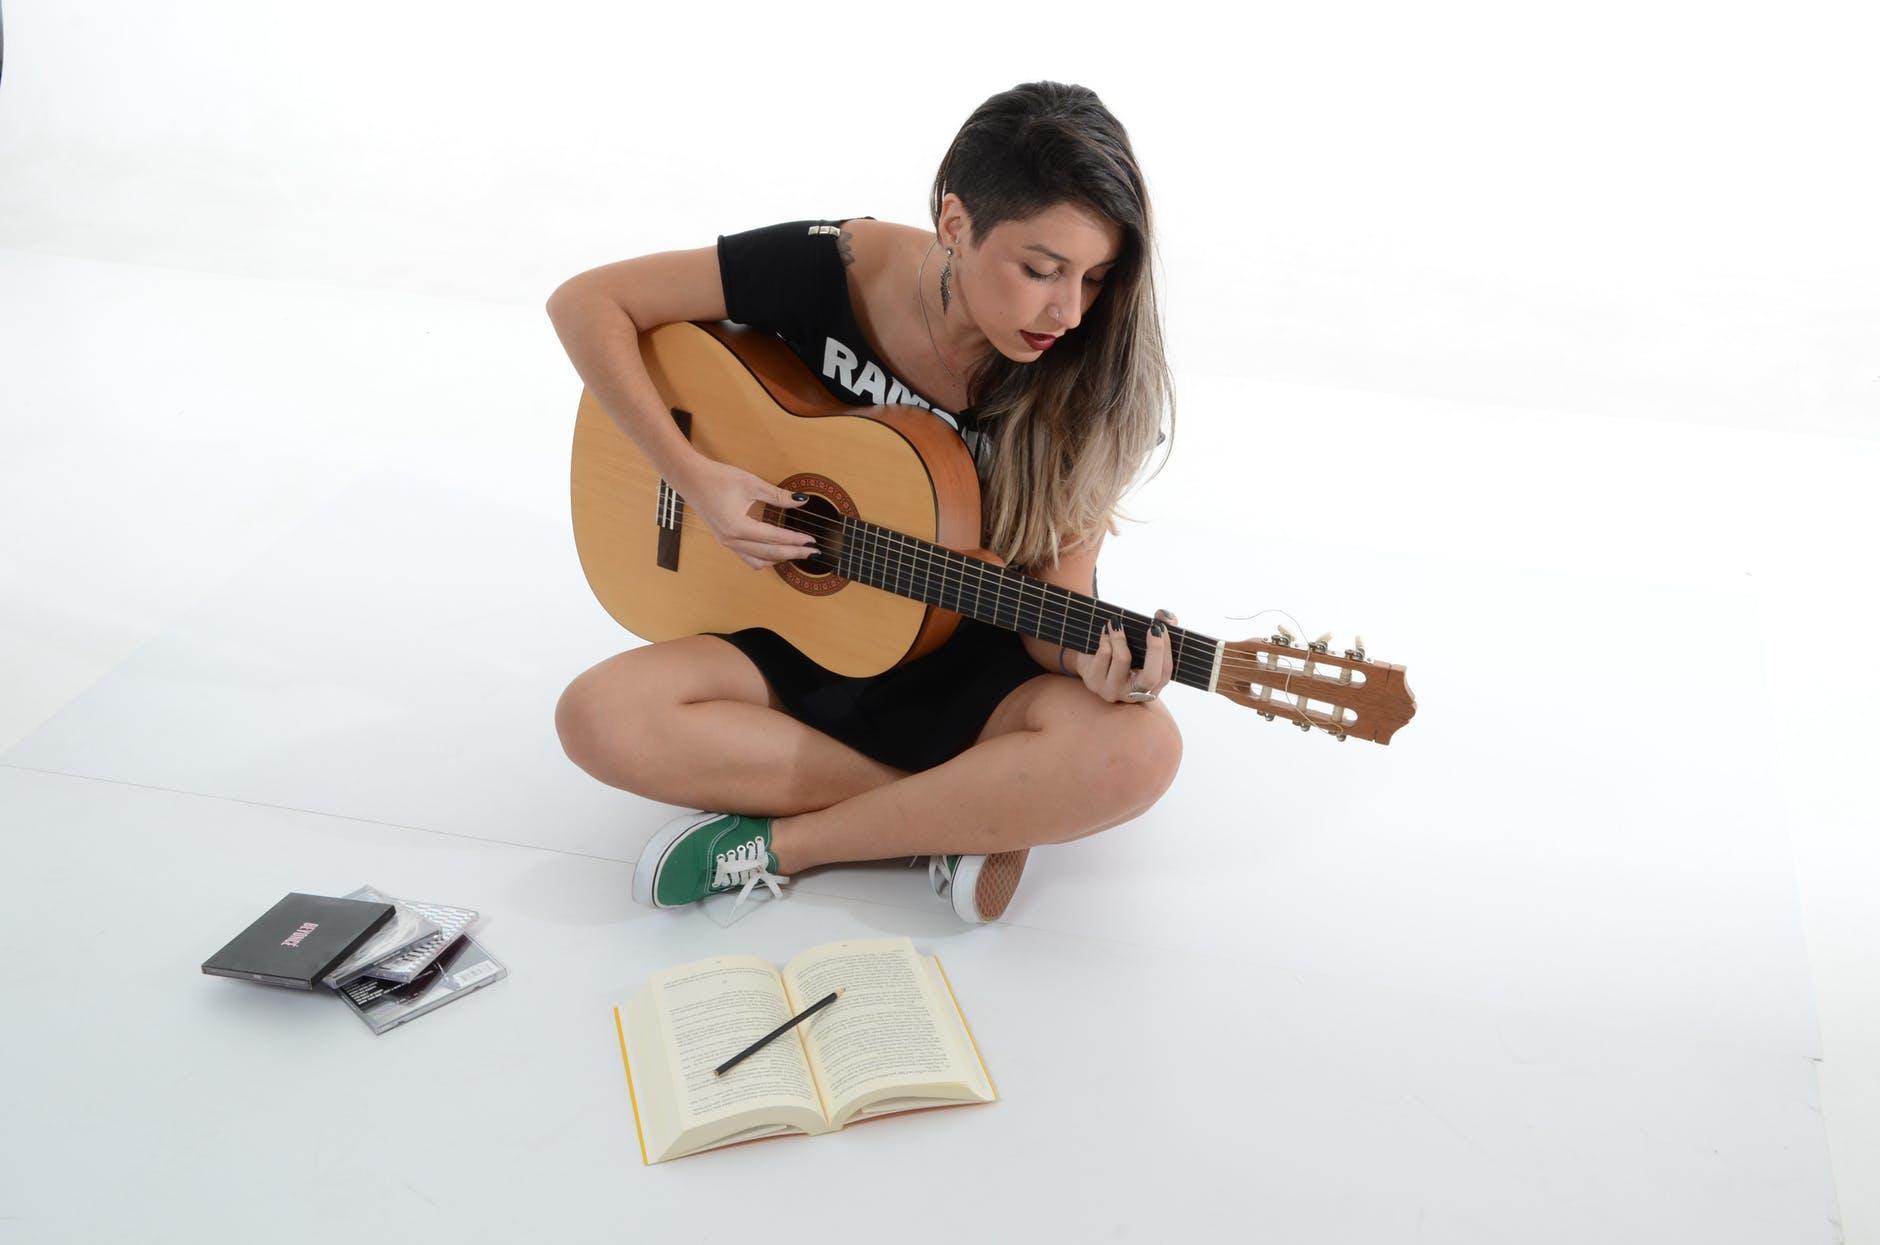 musician practicing